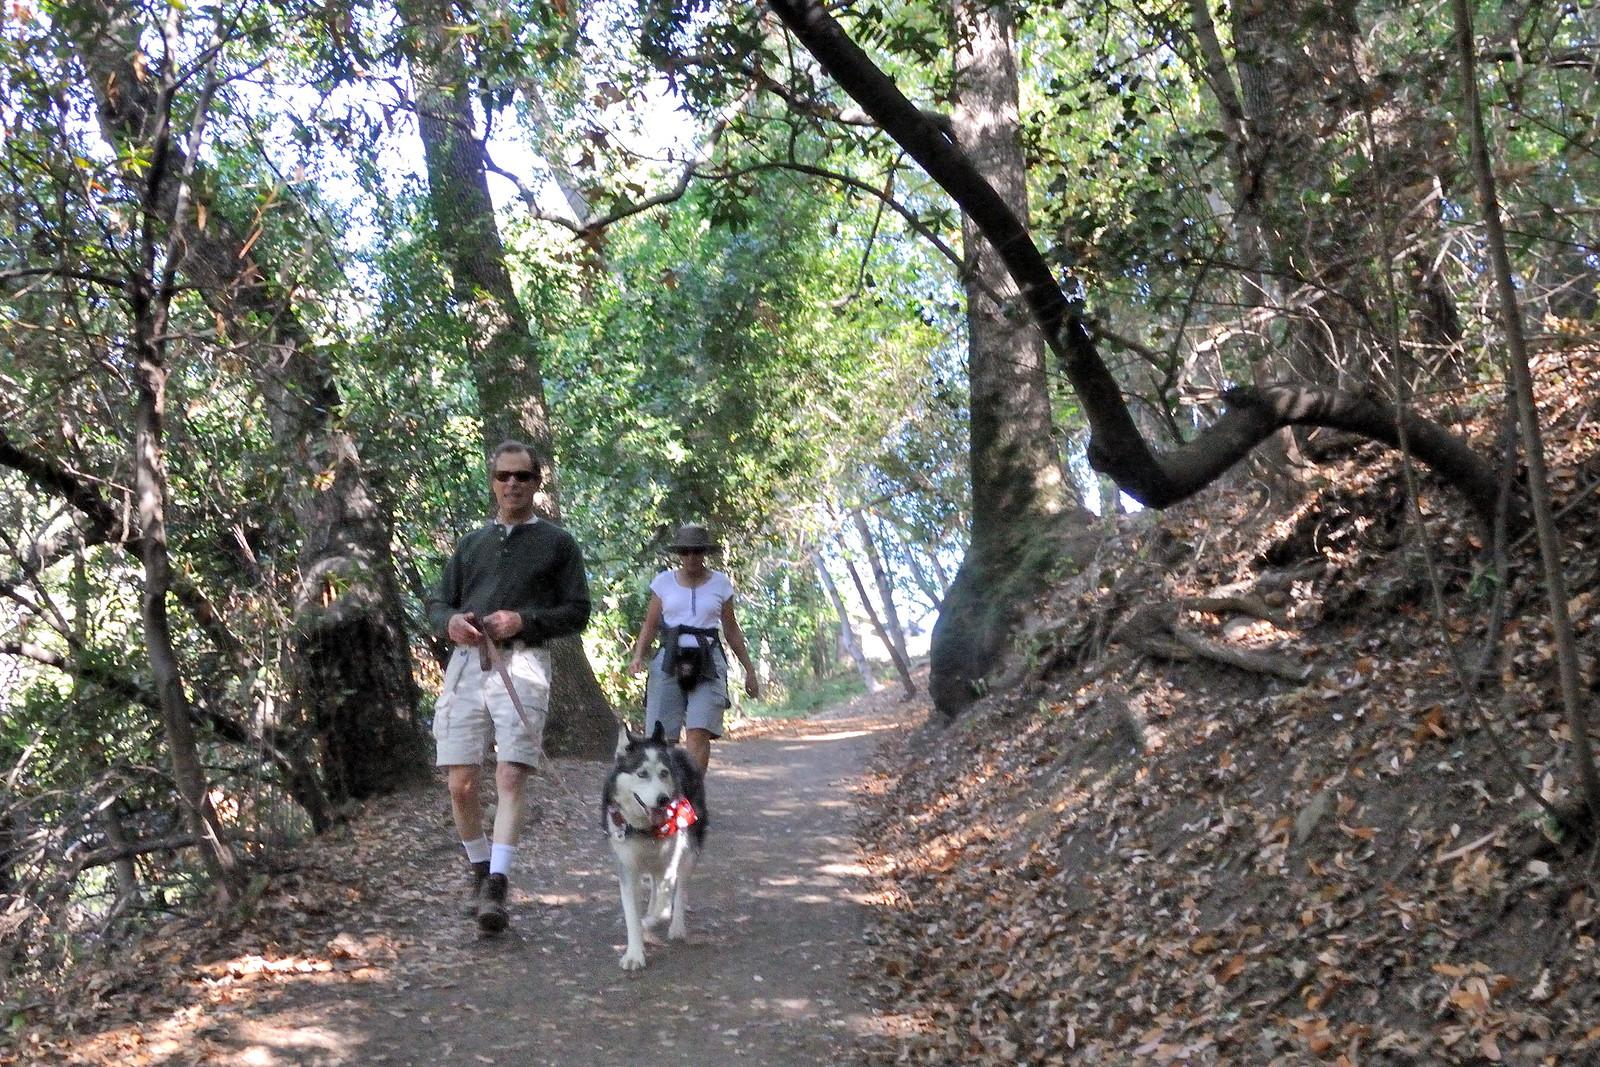 Walking the Dog on the Los Gatos Creek Trail